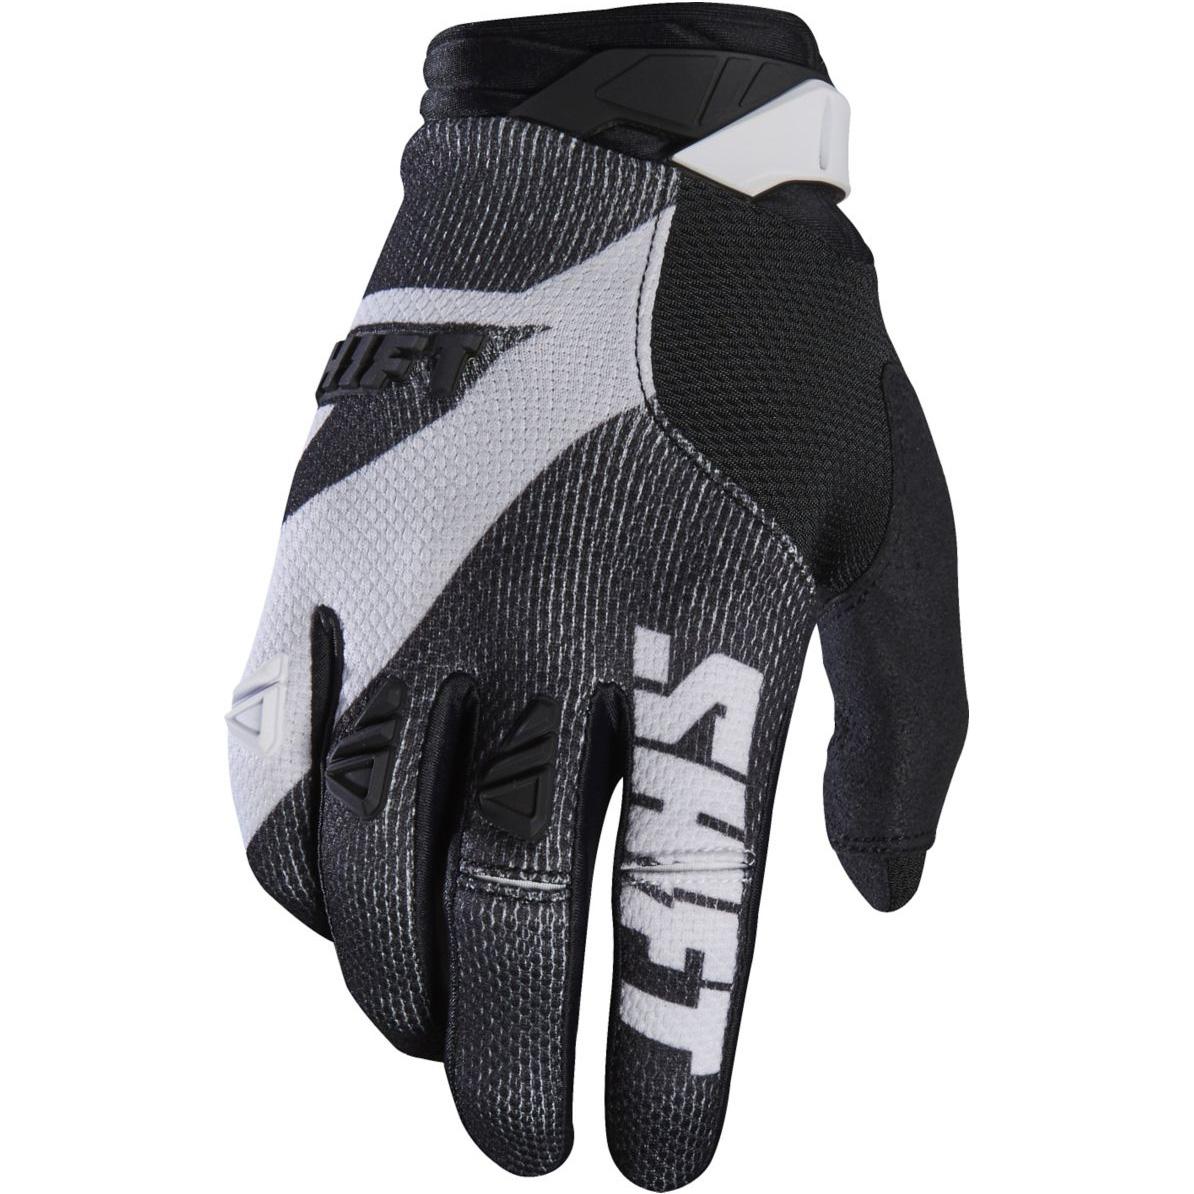 Shift - 2017 3LACK PRO Mainline перчатки, черно-белые